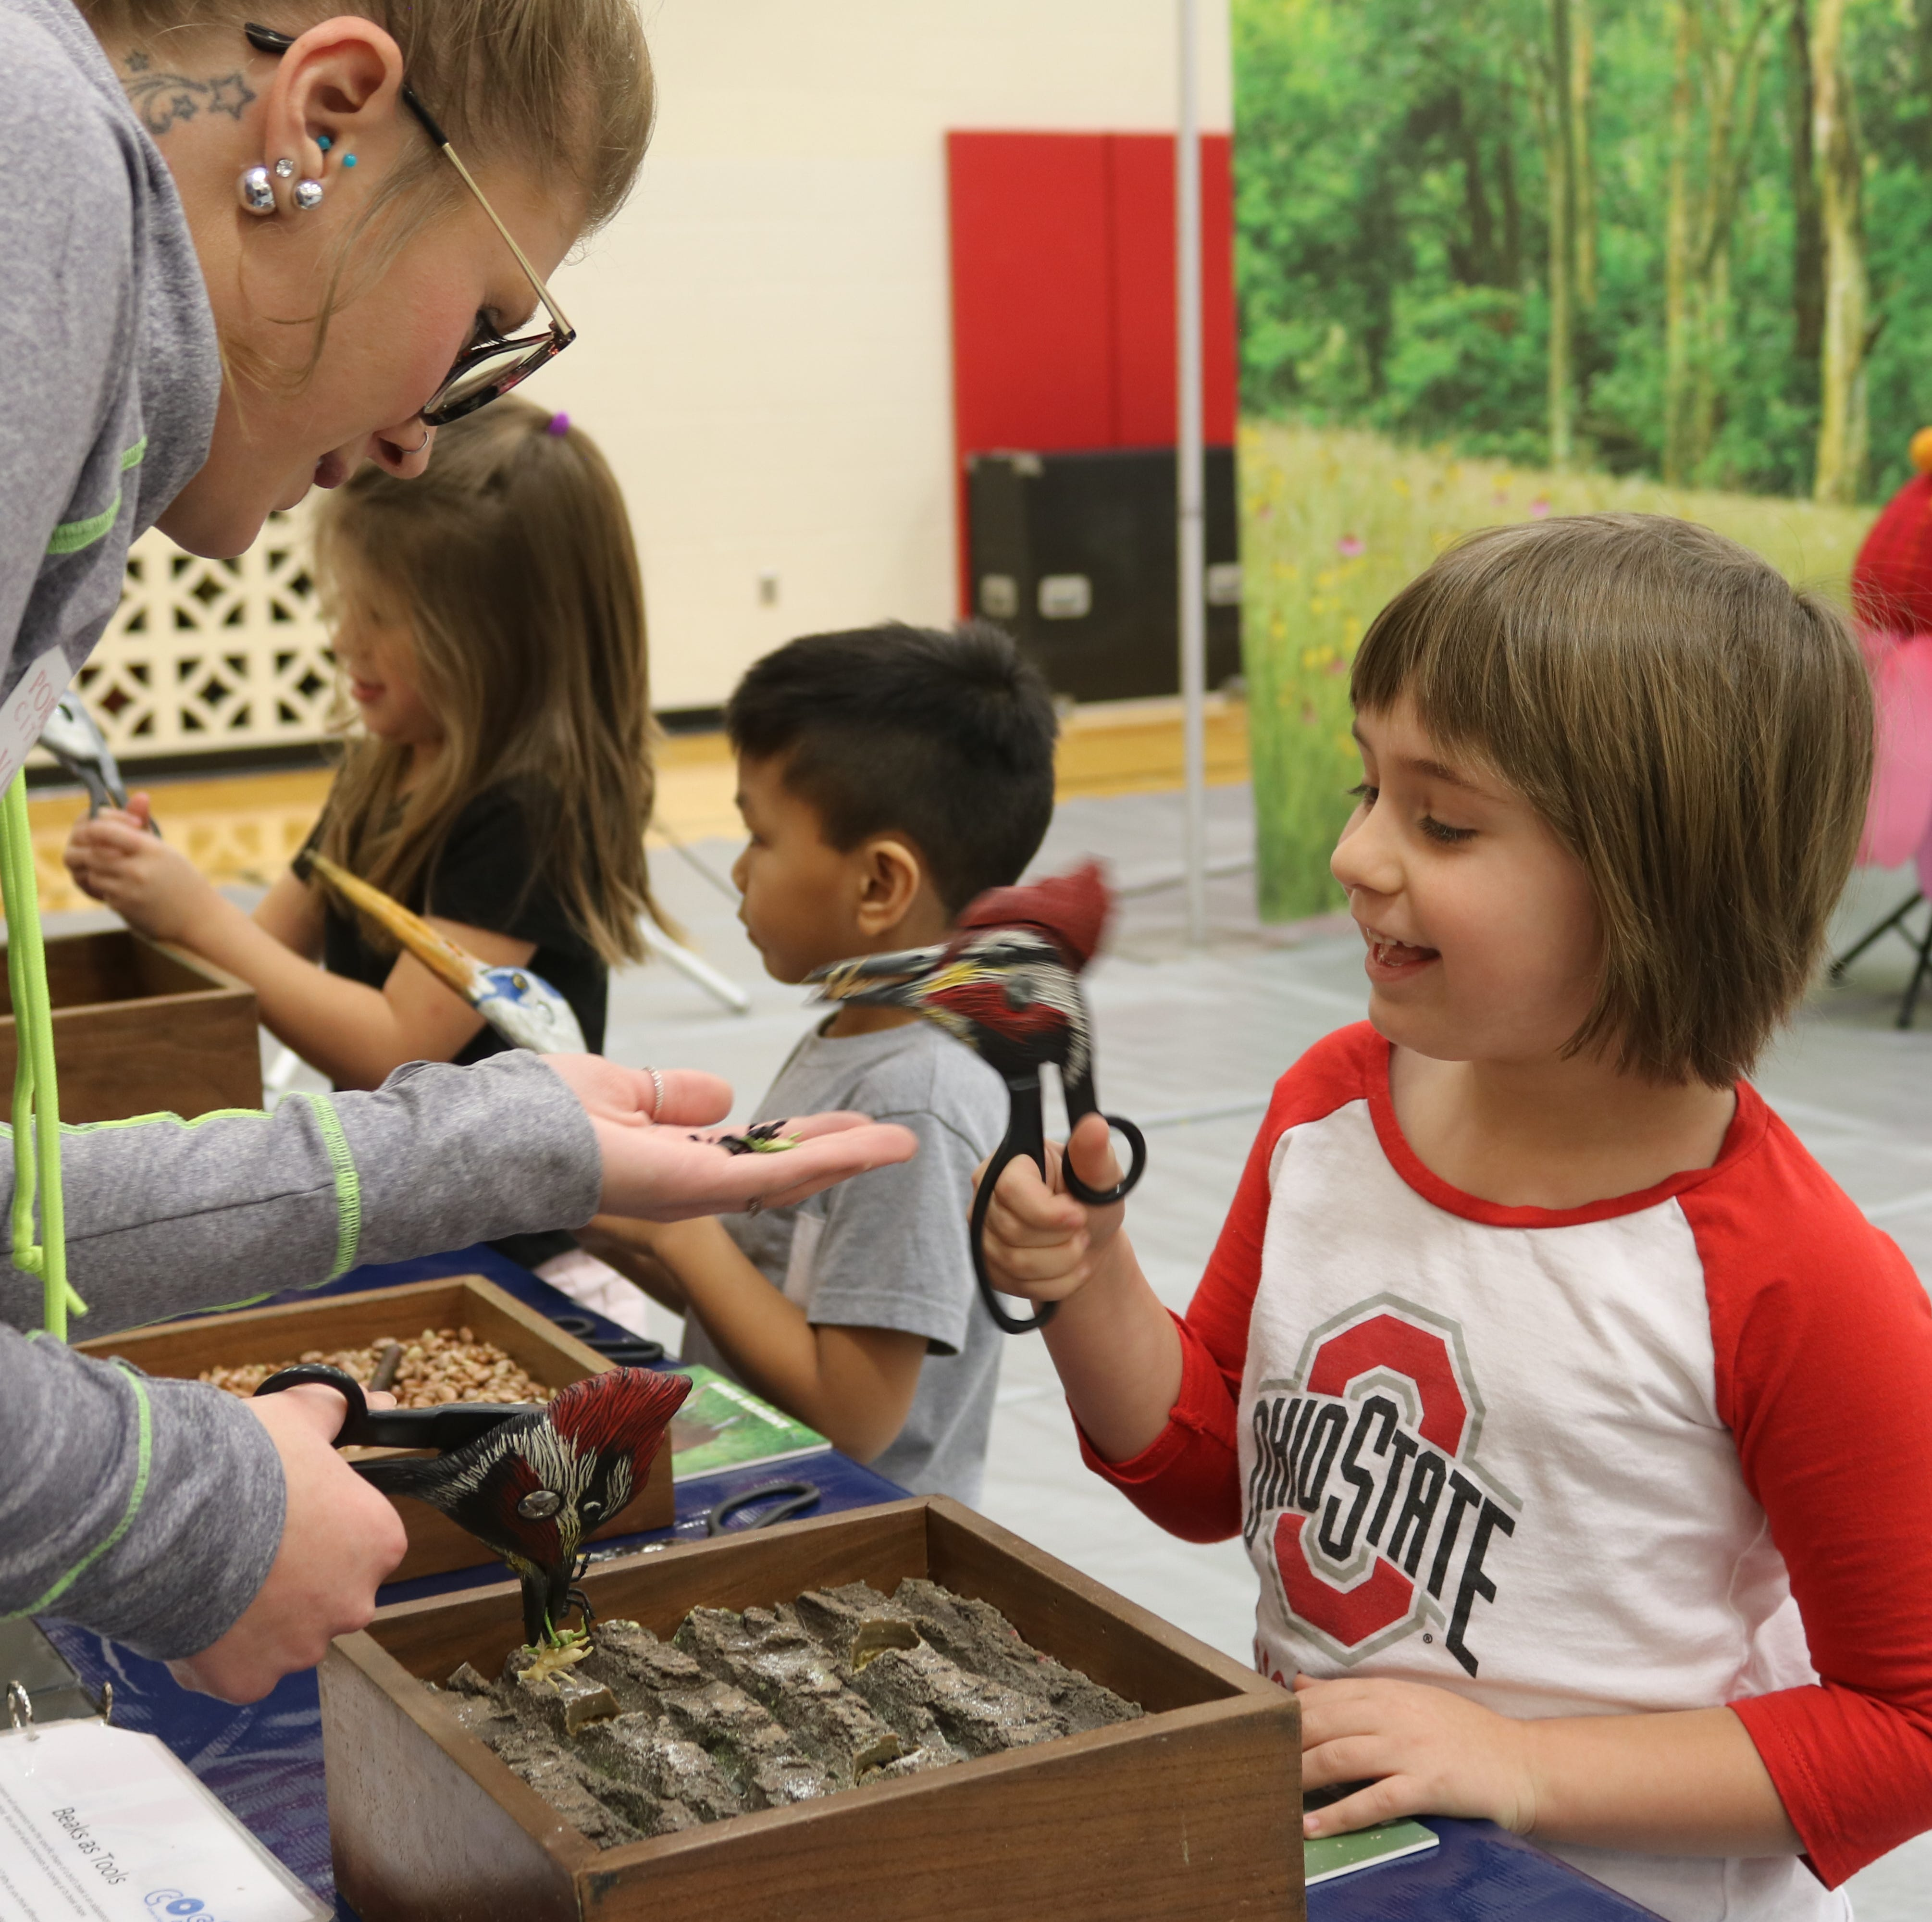 Kids explore ecology at COSI on Wheels program